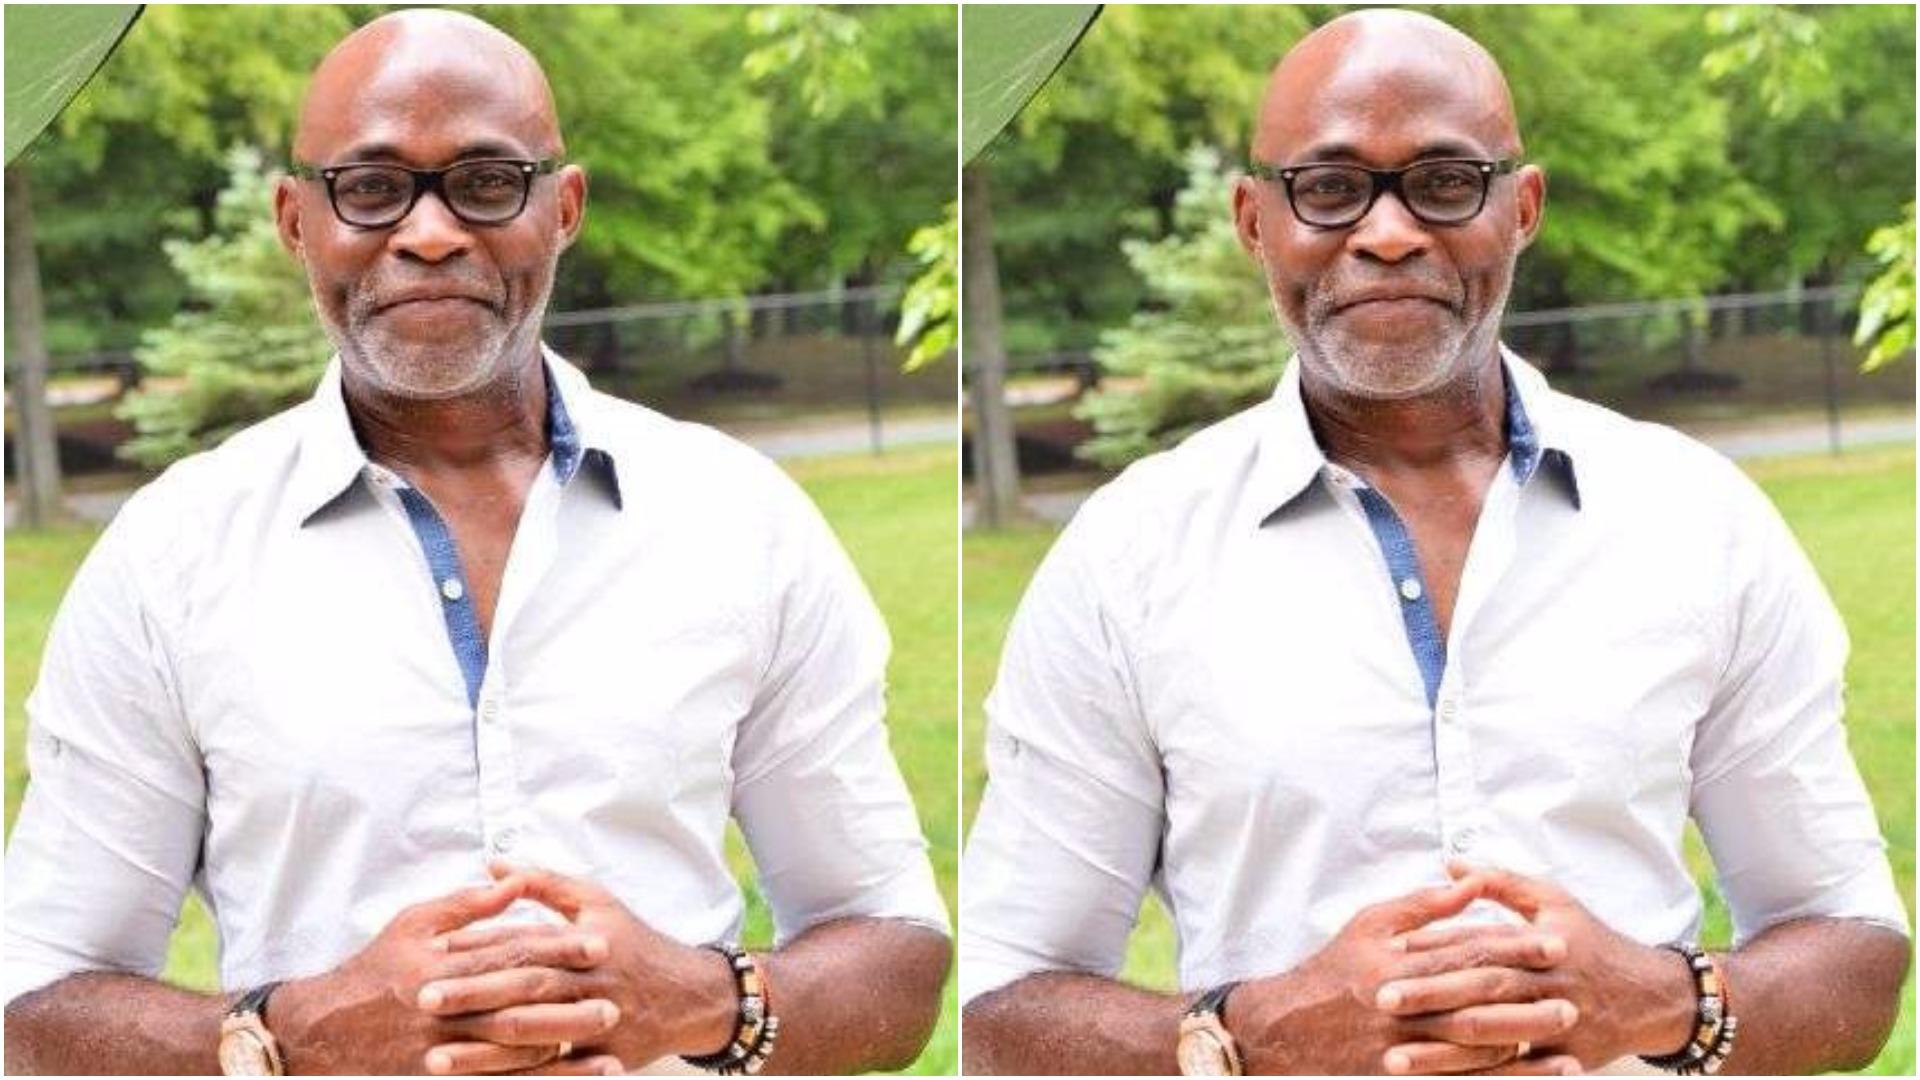 Richard Mofe-Damijo named Nigeria's best dressed man